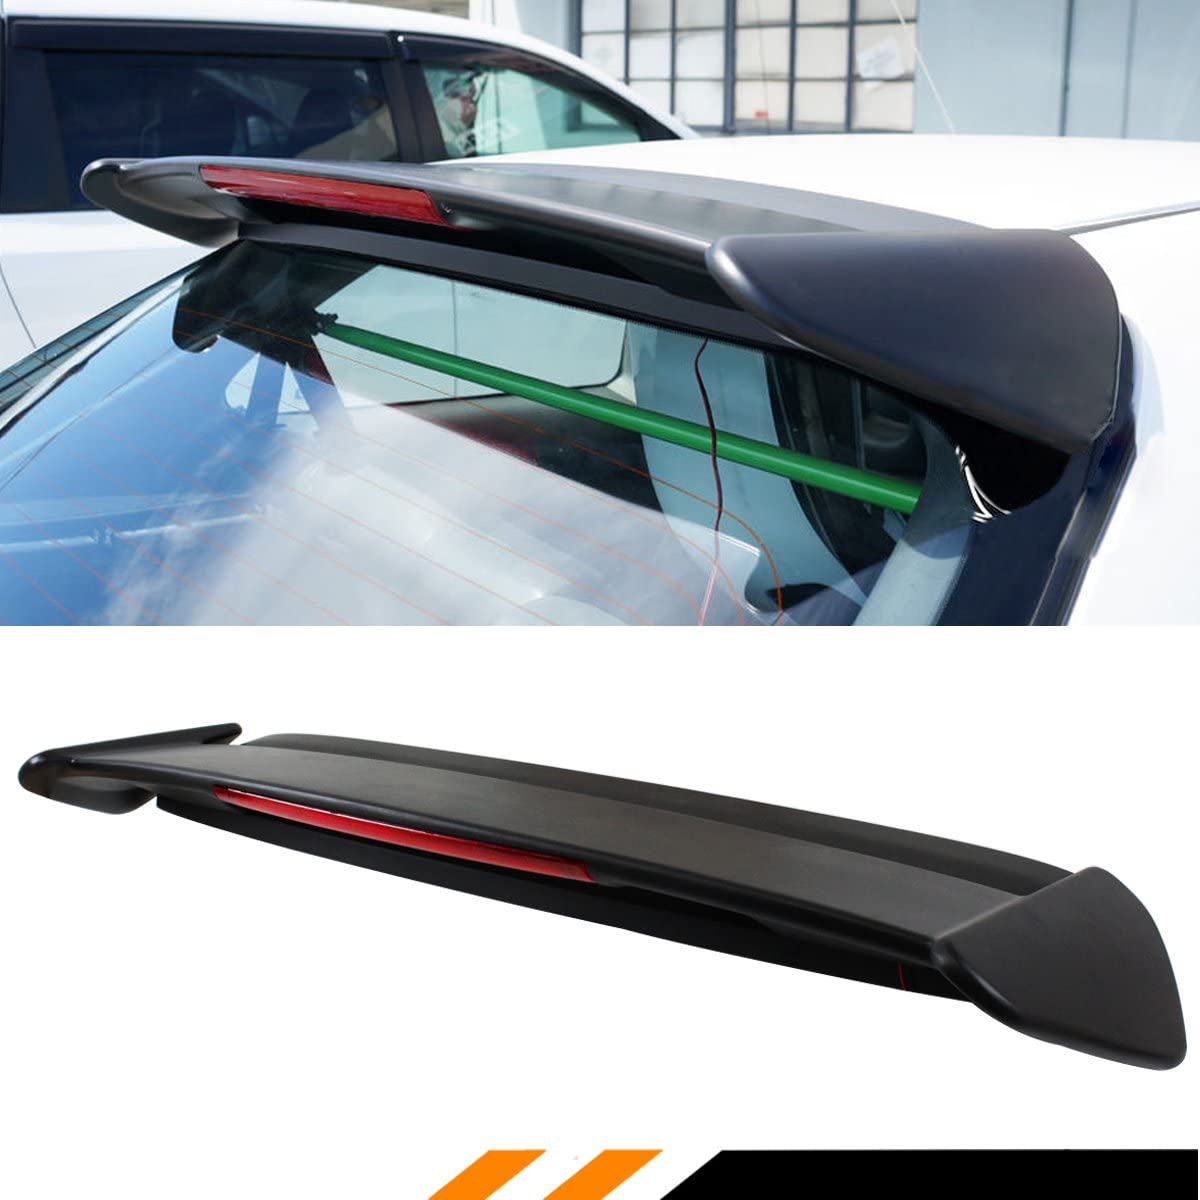 Cuztom Tuning Fits for 1996-2000 Civic EK EK9 3 Door Hatchback Type-R Style Roof Spoiler Wing W//LED Light